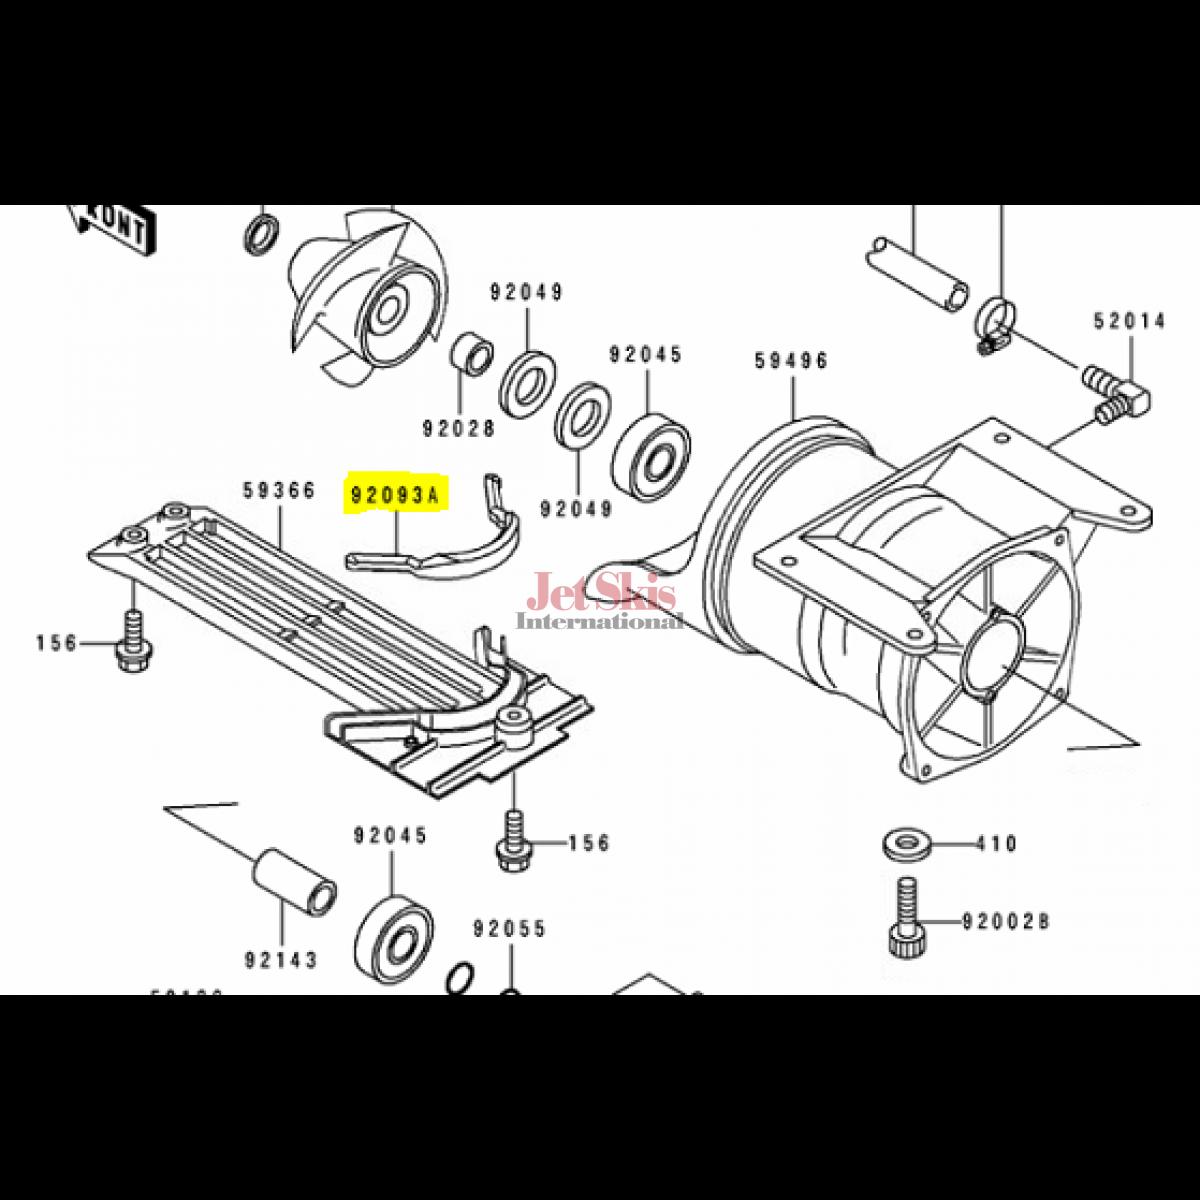 volvo 240 alternator wiring harness with Wiring Diagram Volvo F12 on Volvo Penta Fuel Gauge Wiring Diagram further Volvo Edc Wiring Diagram further 94 Toyota Pickup 22re Wiring Diagram further 150291 No Cut Led Lights Feed Headlight likewise Wiring Diagram Volvo F12.